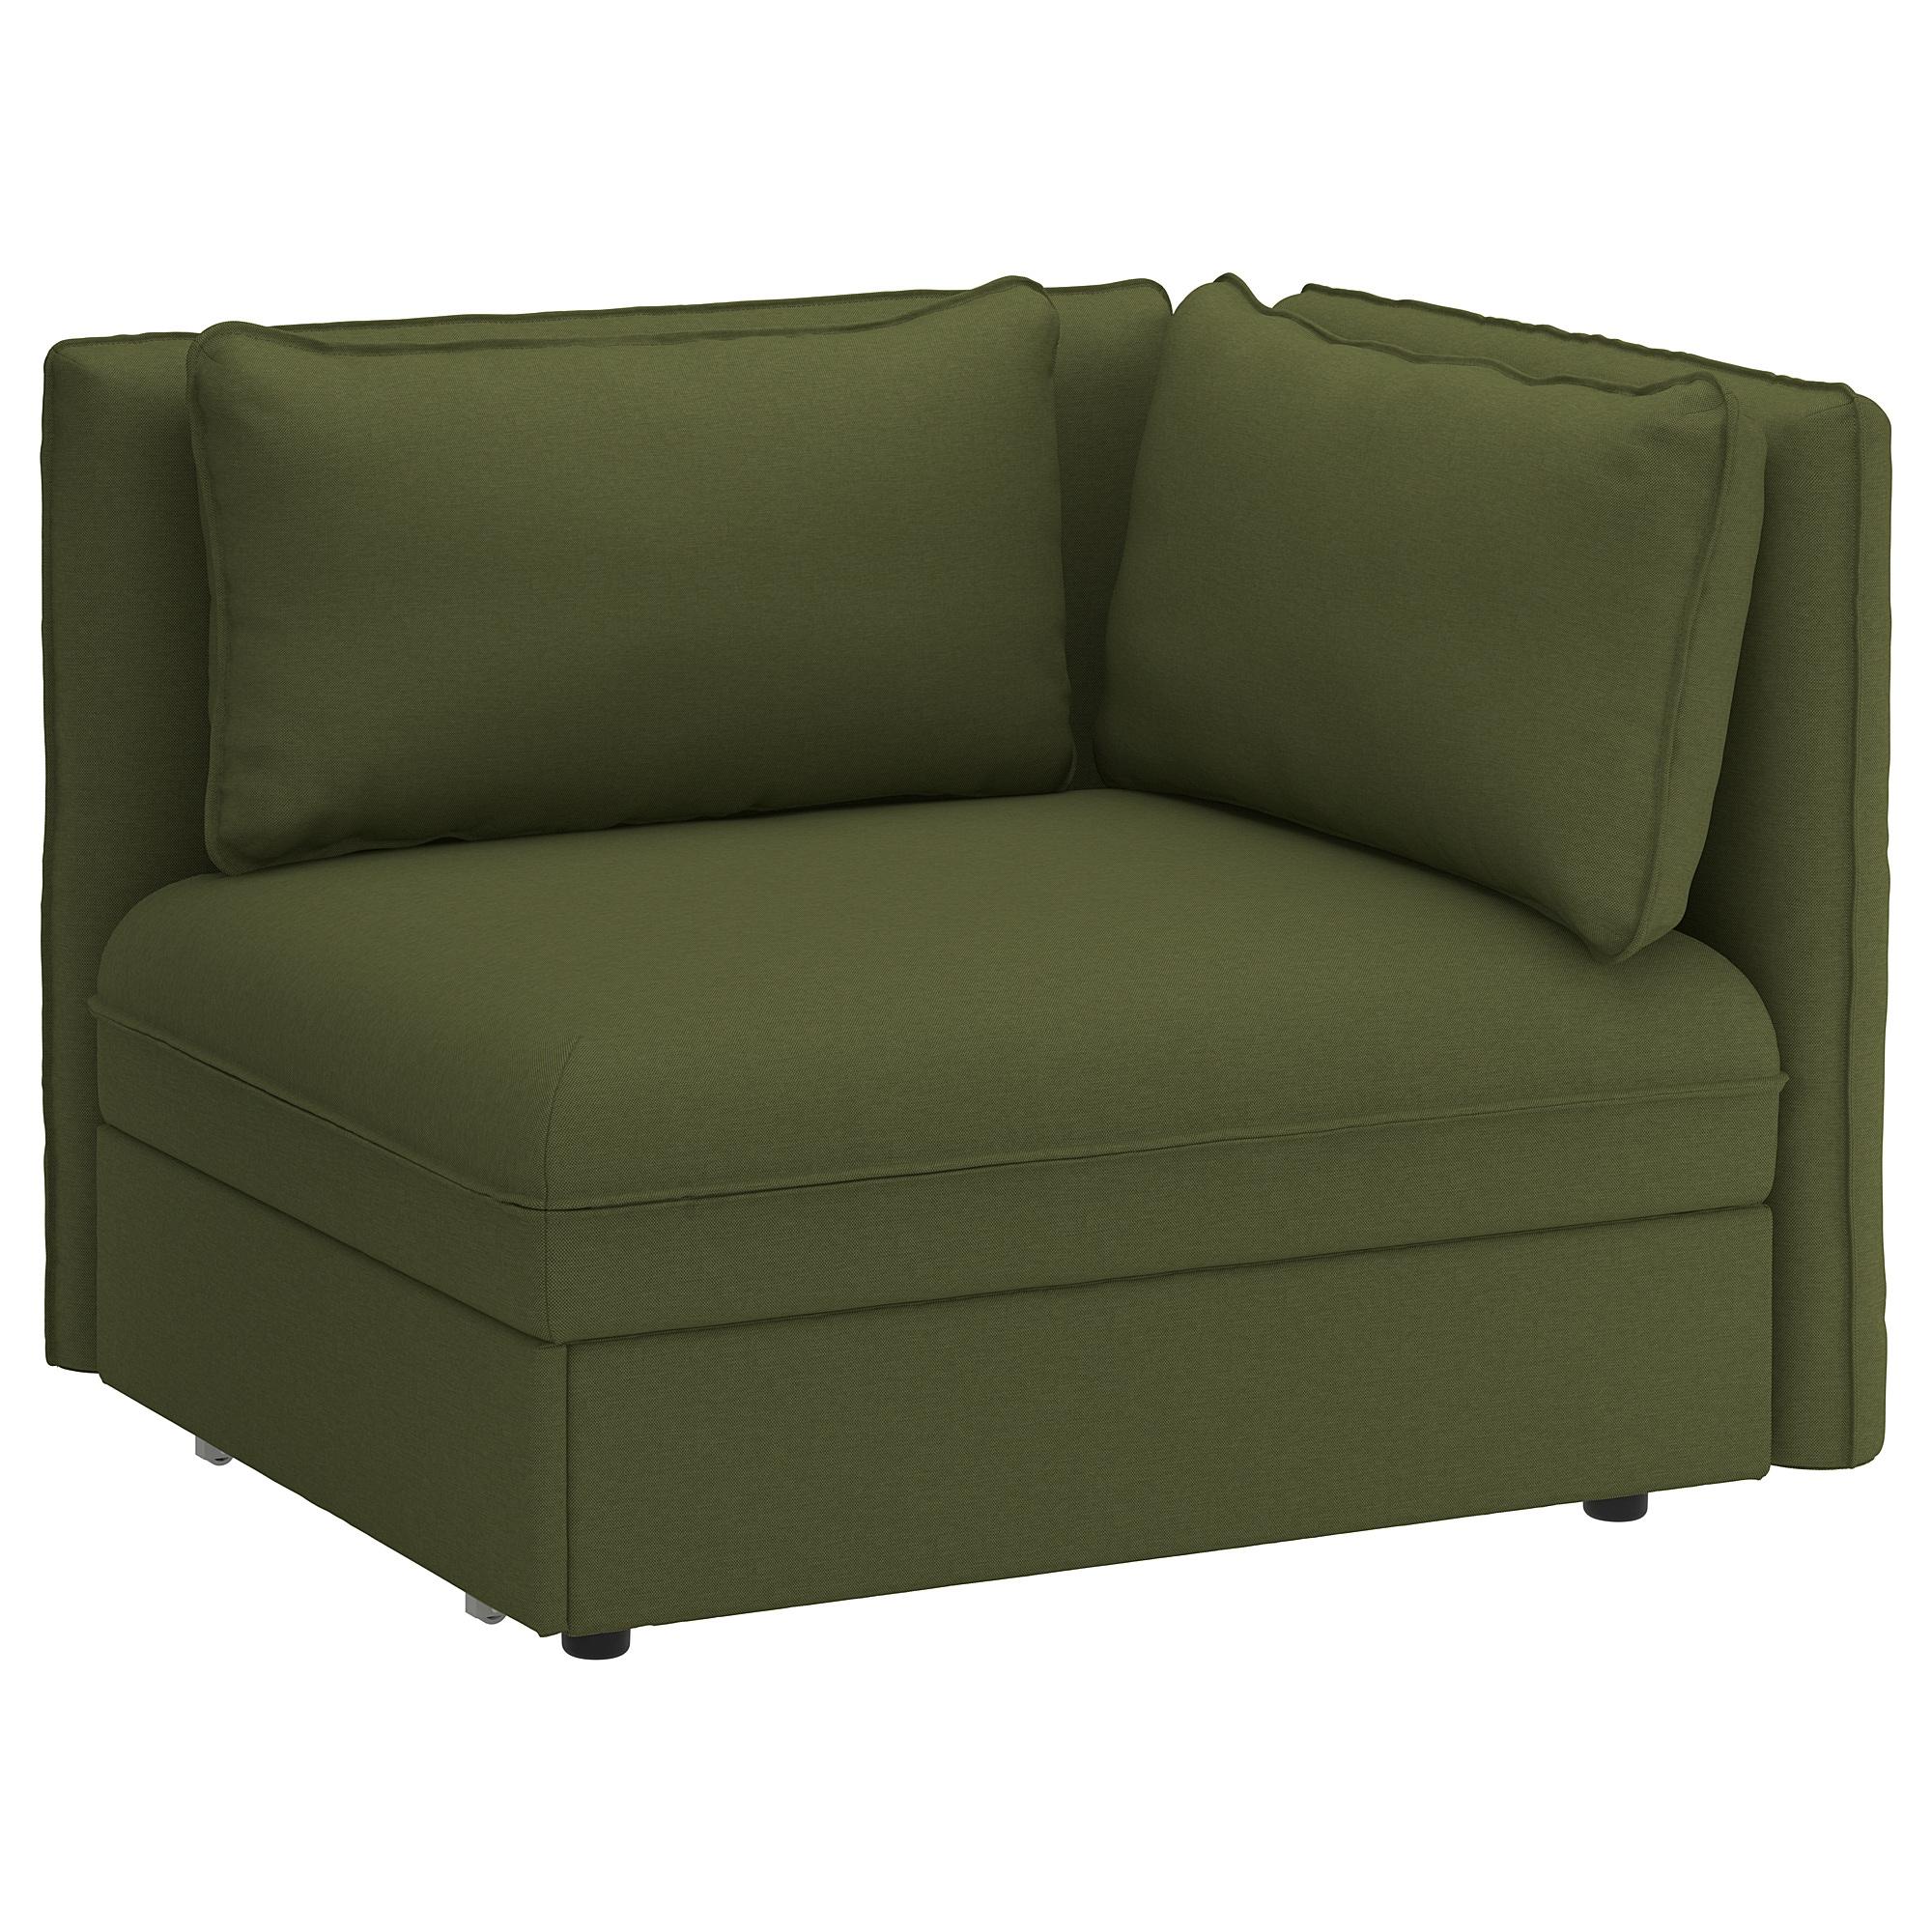 Sofa Cama Desplegable Ftd8 sofà S Cama De Calidad Pra Online Ikea